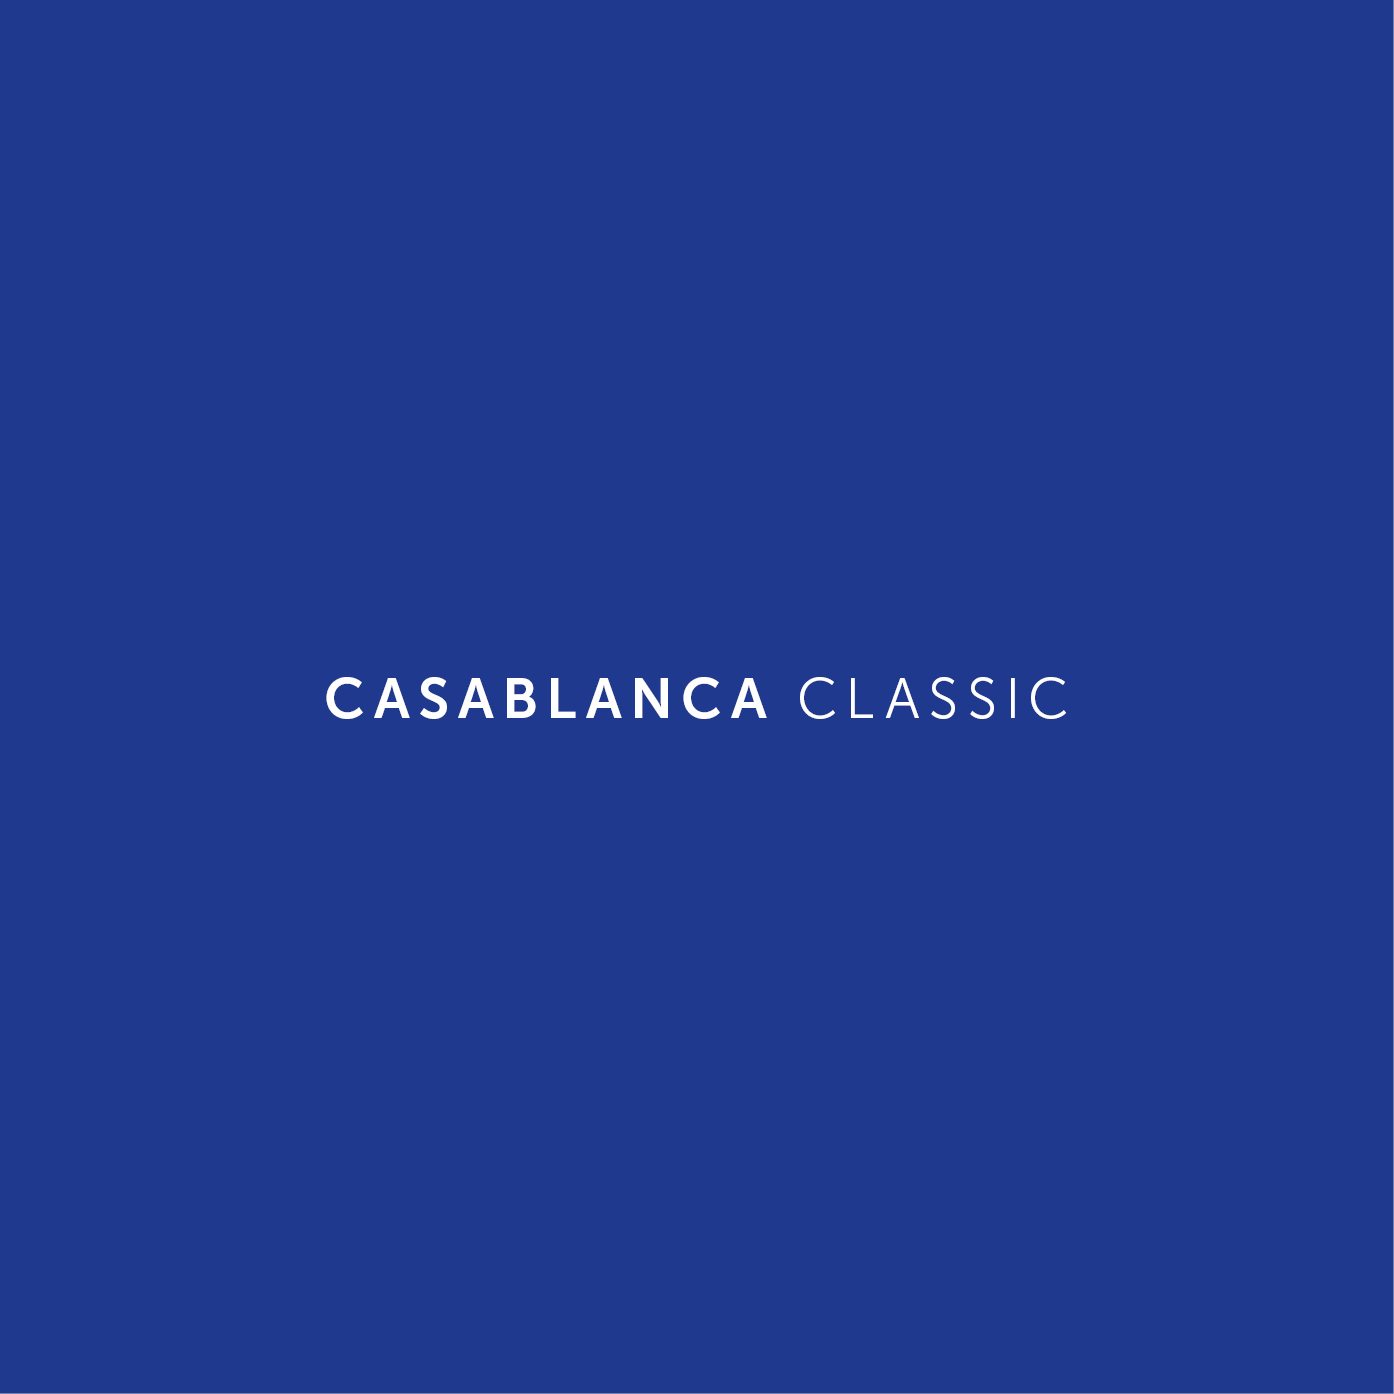 CasablancaClassic-Title-02.jpg